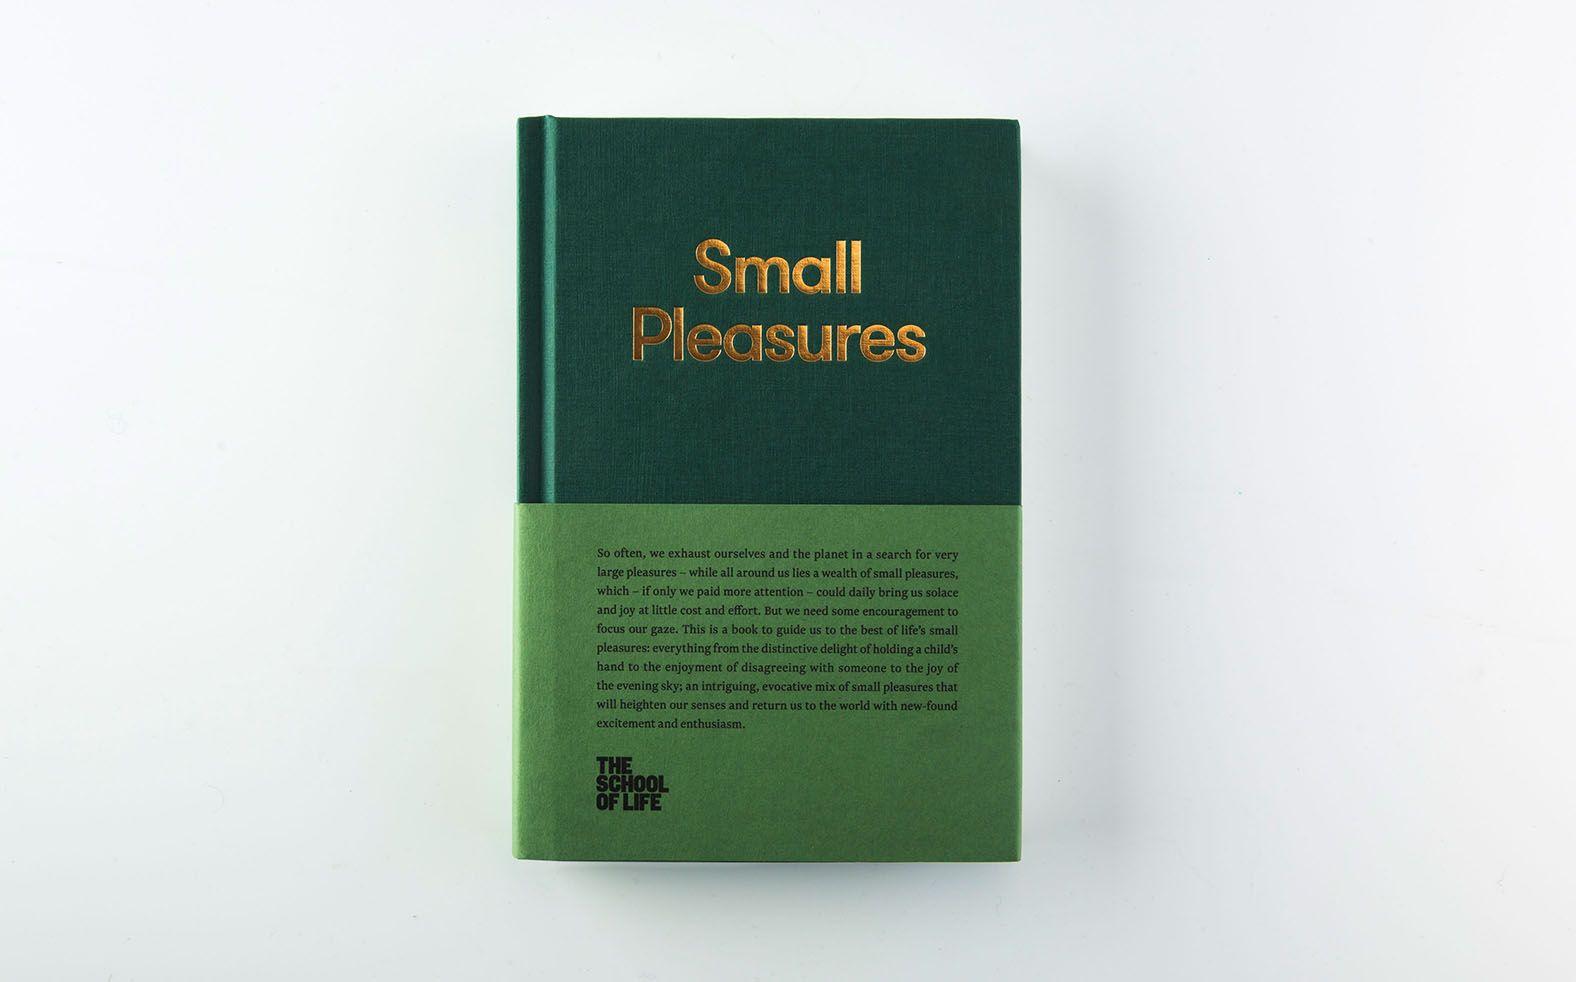 The School of Life - Small Pleasures